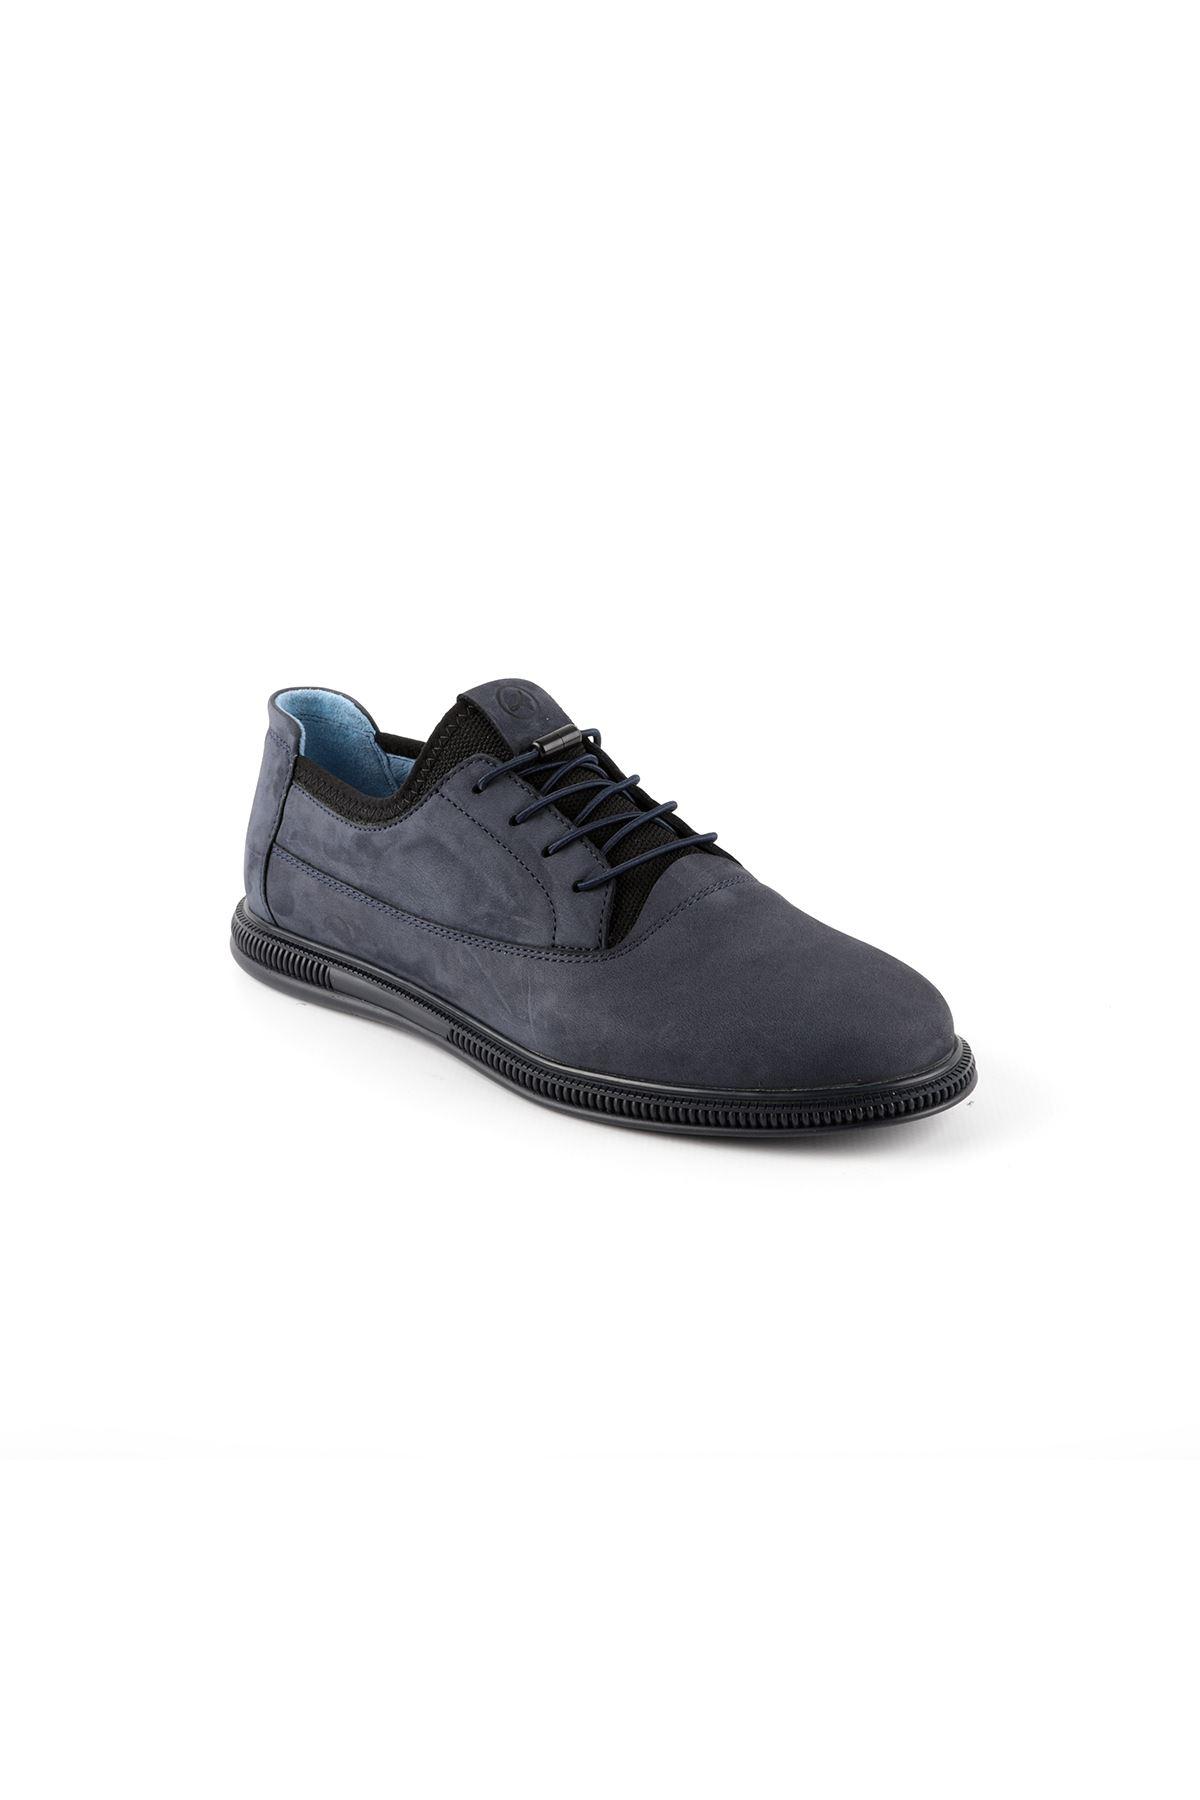 Libero L3726 Lacivert Casual Erkek Ayakkabı